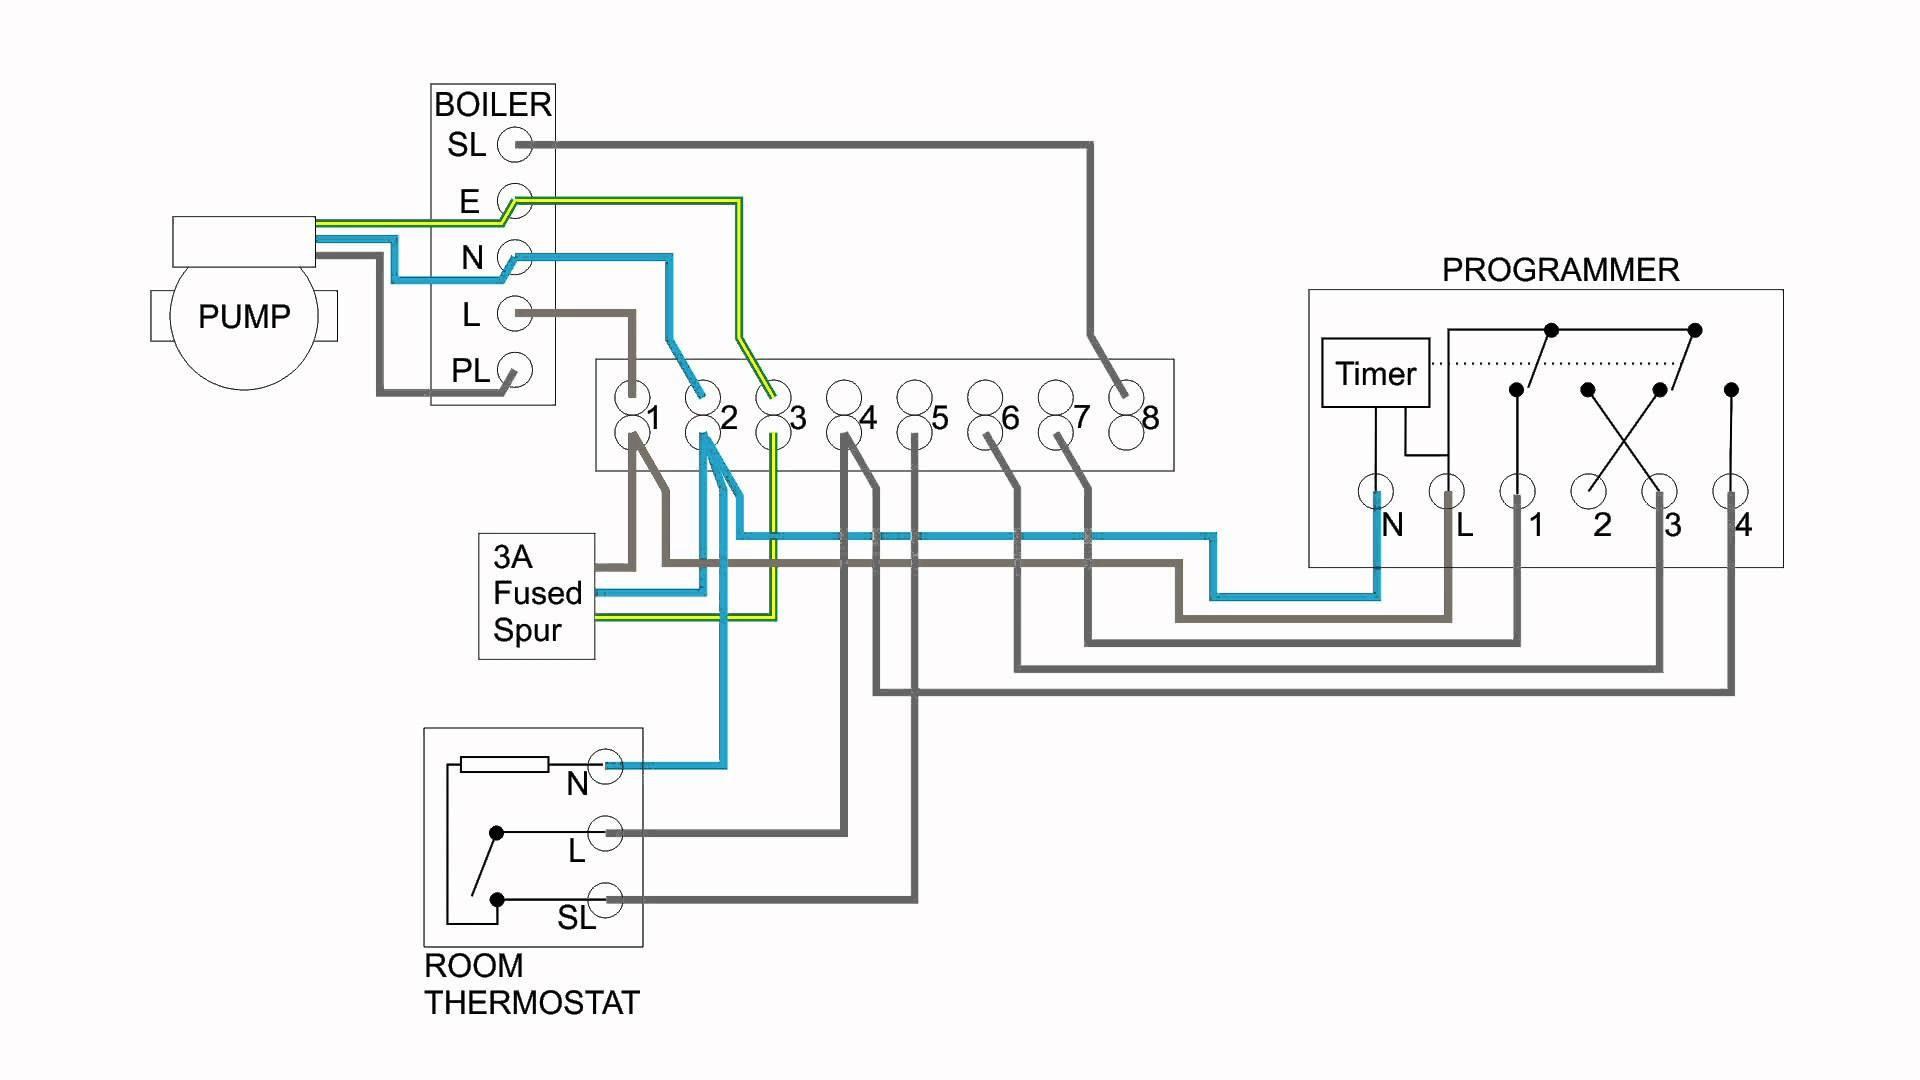 hight resolution of honeywell wiring diagram wiring diagram image honeywell thermostat wiring diagram keystone rv thermostat wiring diagram